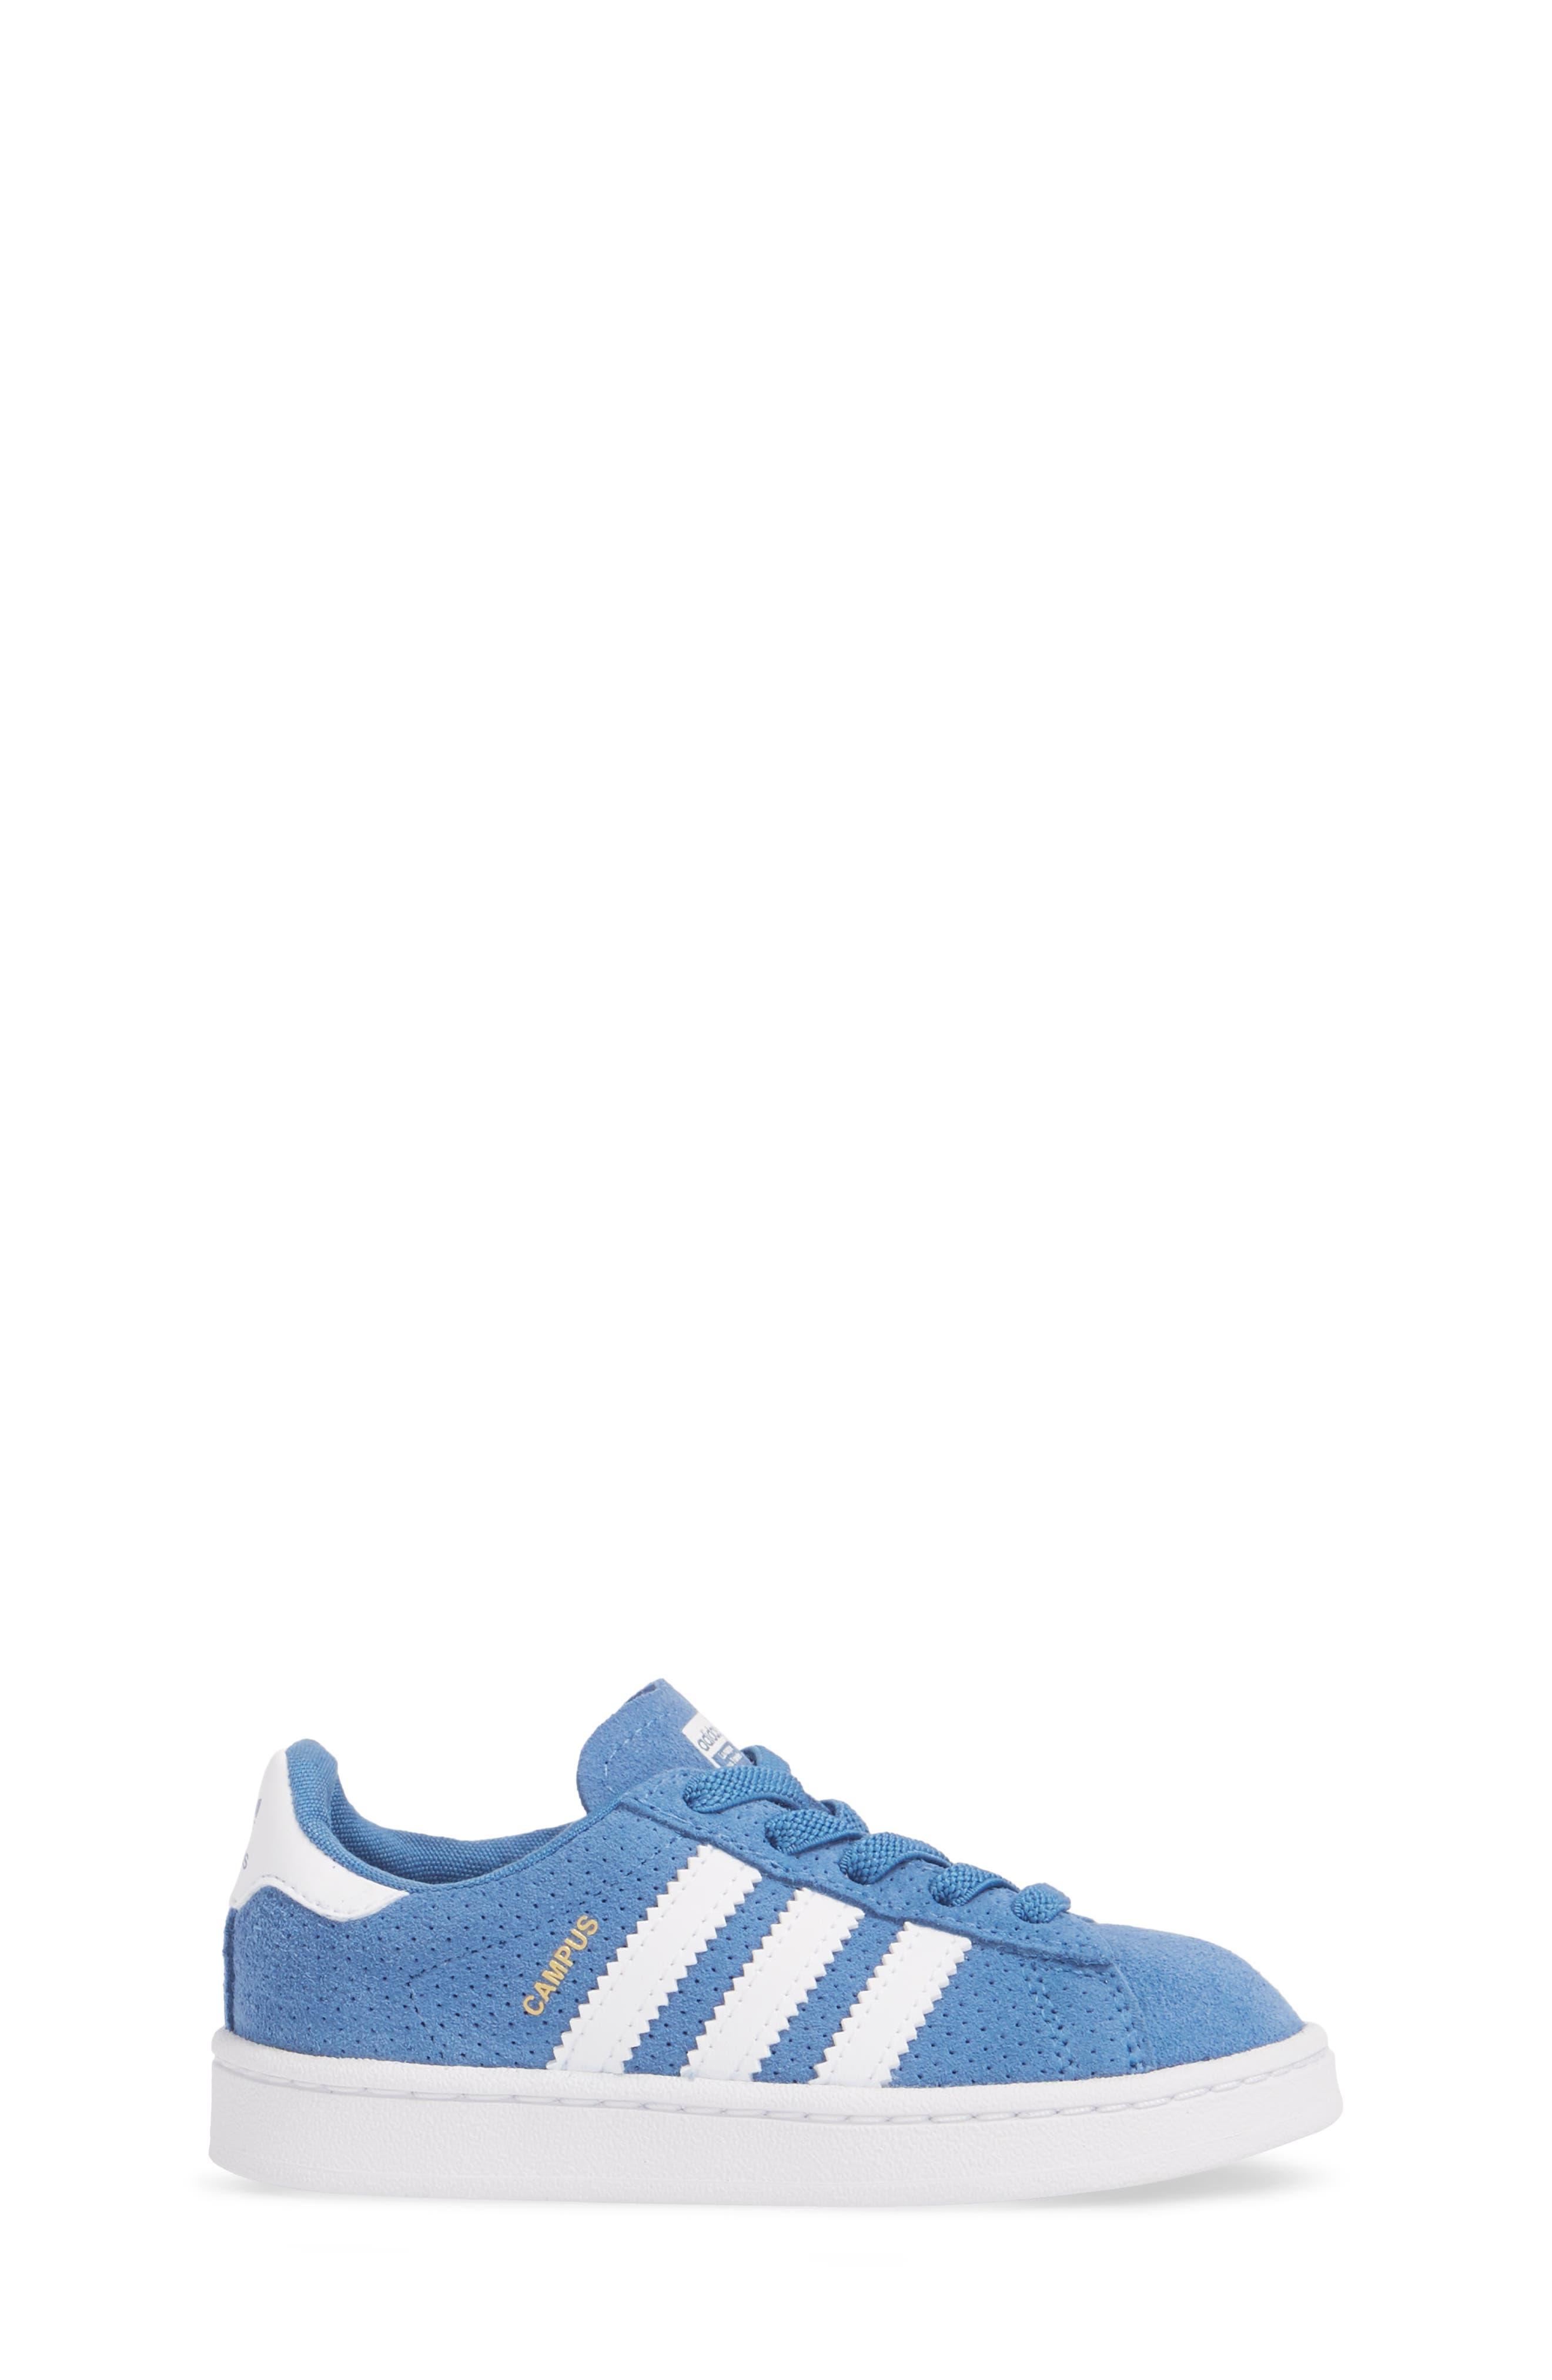 Campus J Sneaker,                             Alternate thumbnail 3, color,                             Trace Royal / White / White